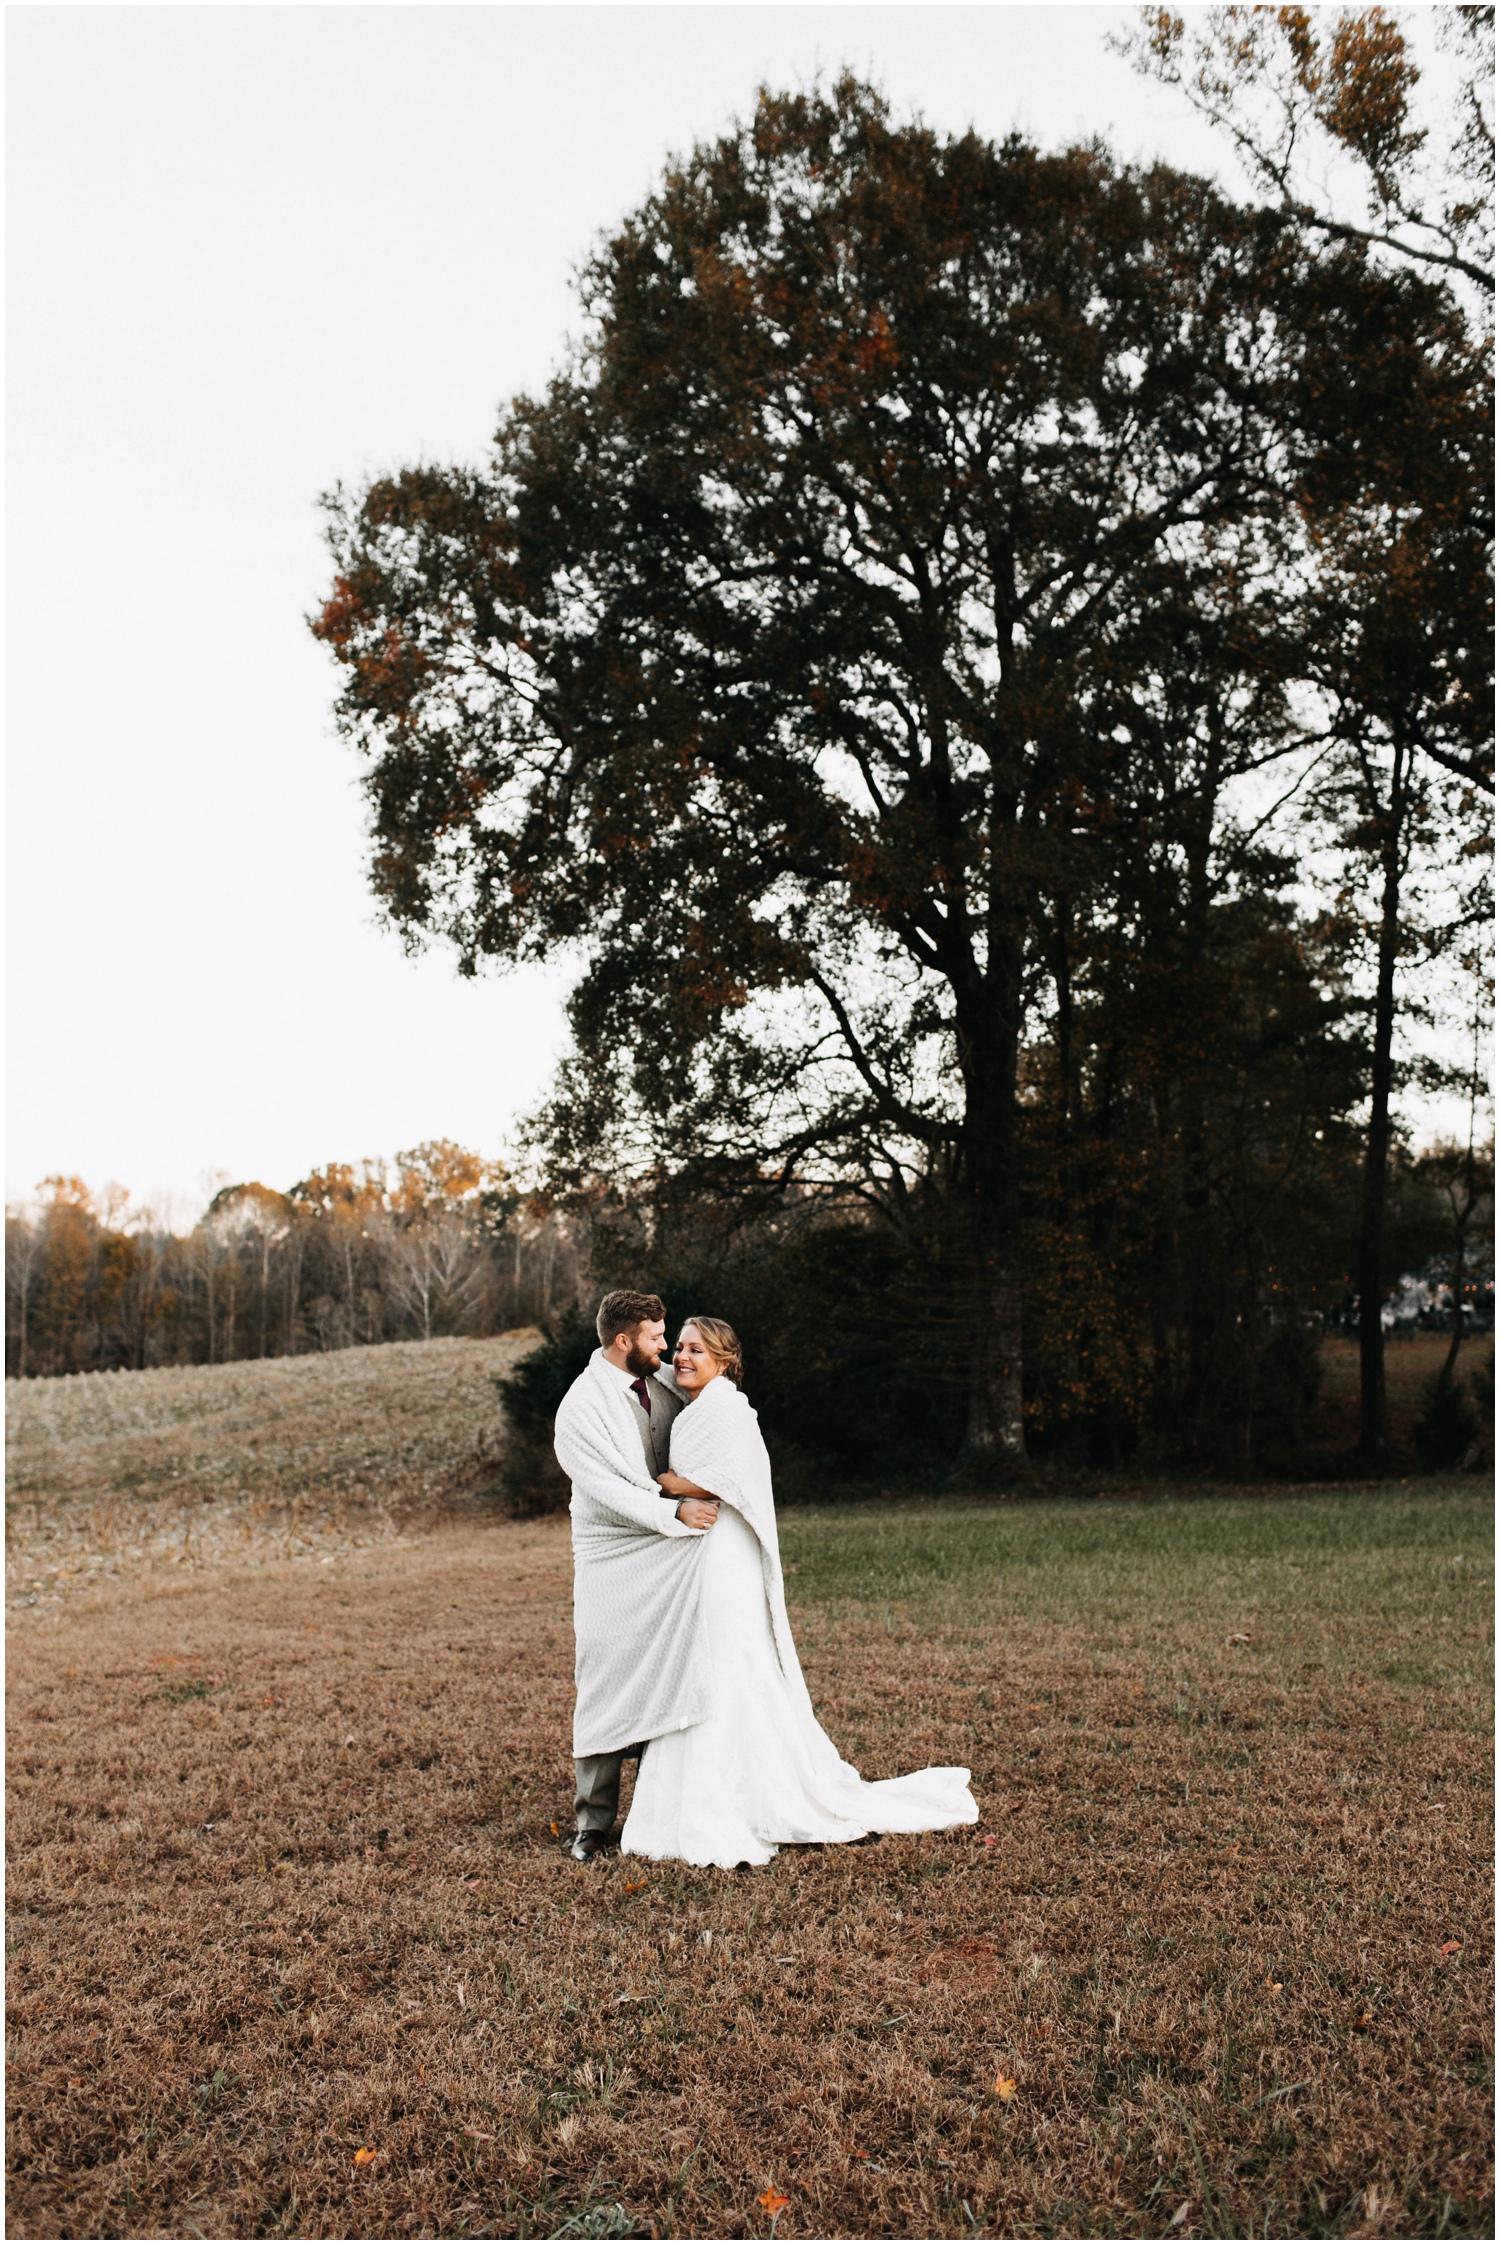 Jess+Dan_rustic_southern_farm_fall_wedding_charlotte_north carolina_taylor powers_0227.jpg